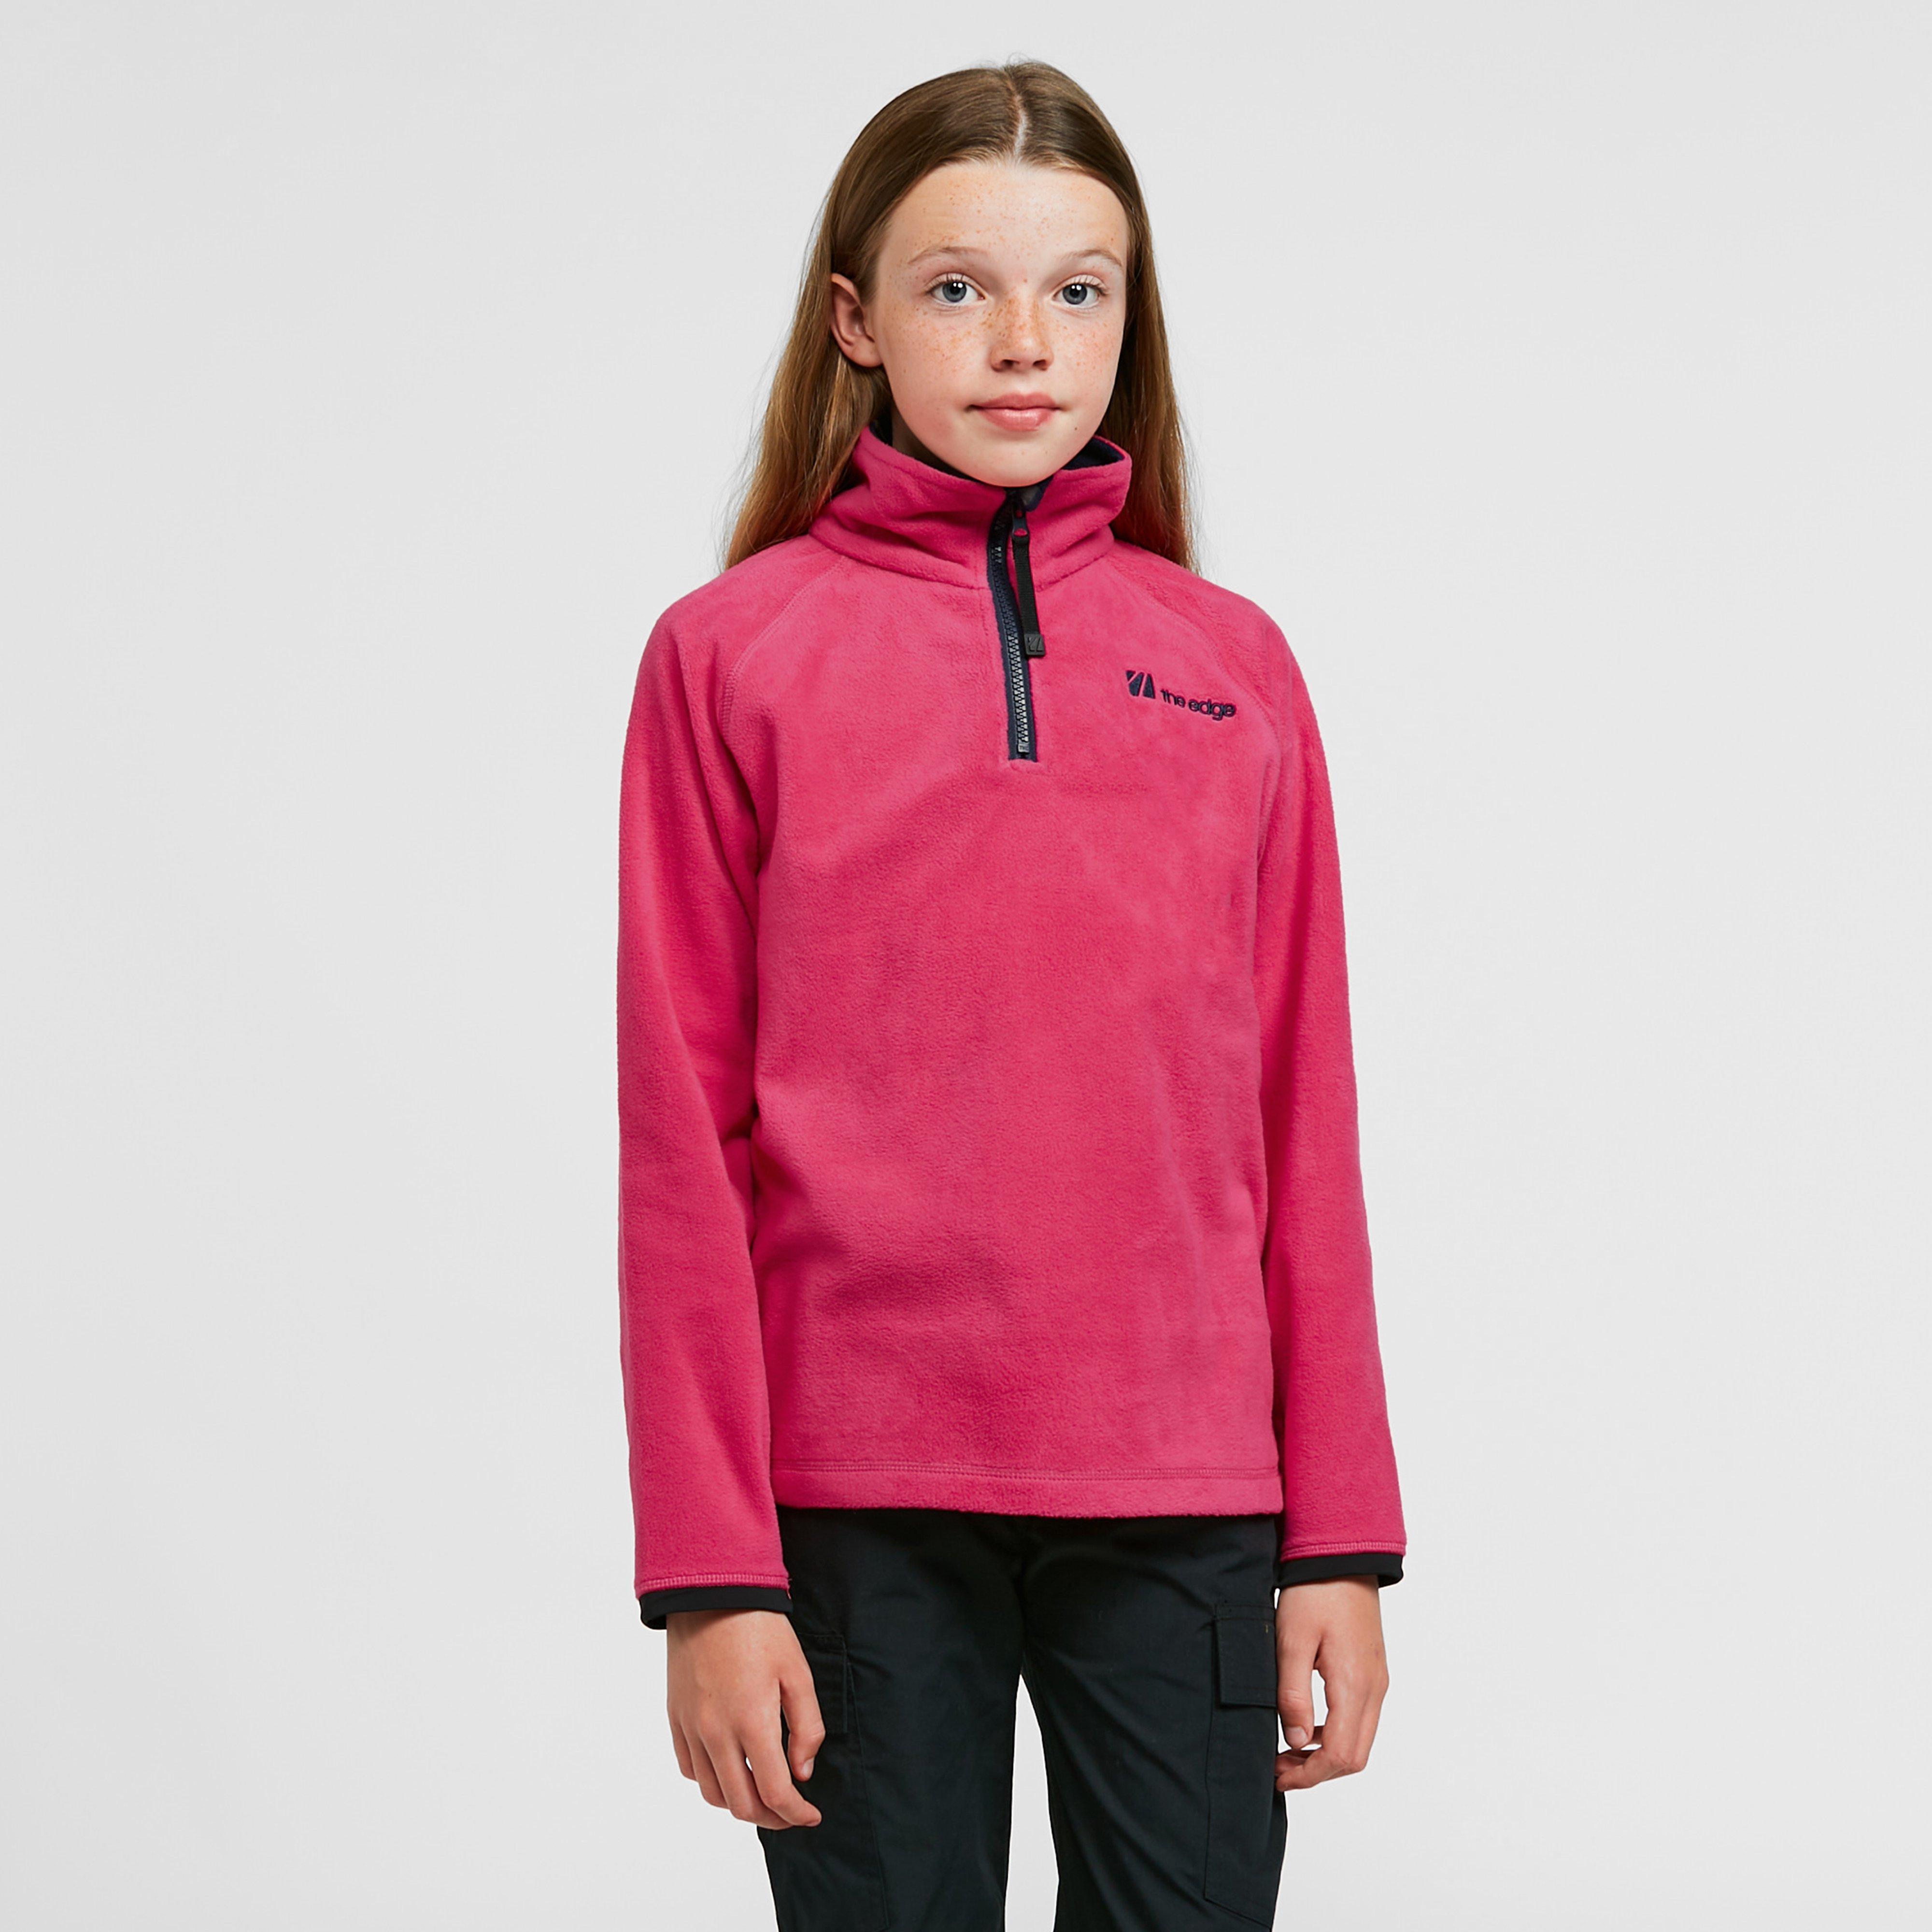 The Edge Kids Ascend Pull On Fleece - Pink/kids  Pink/kids